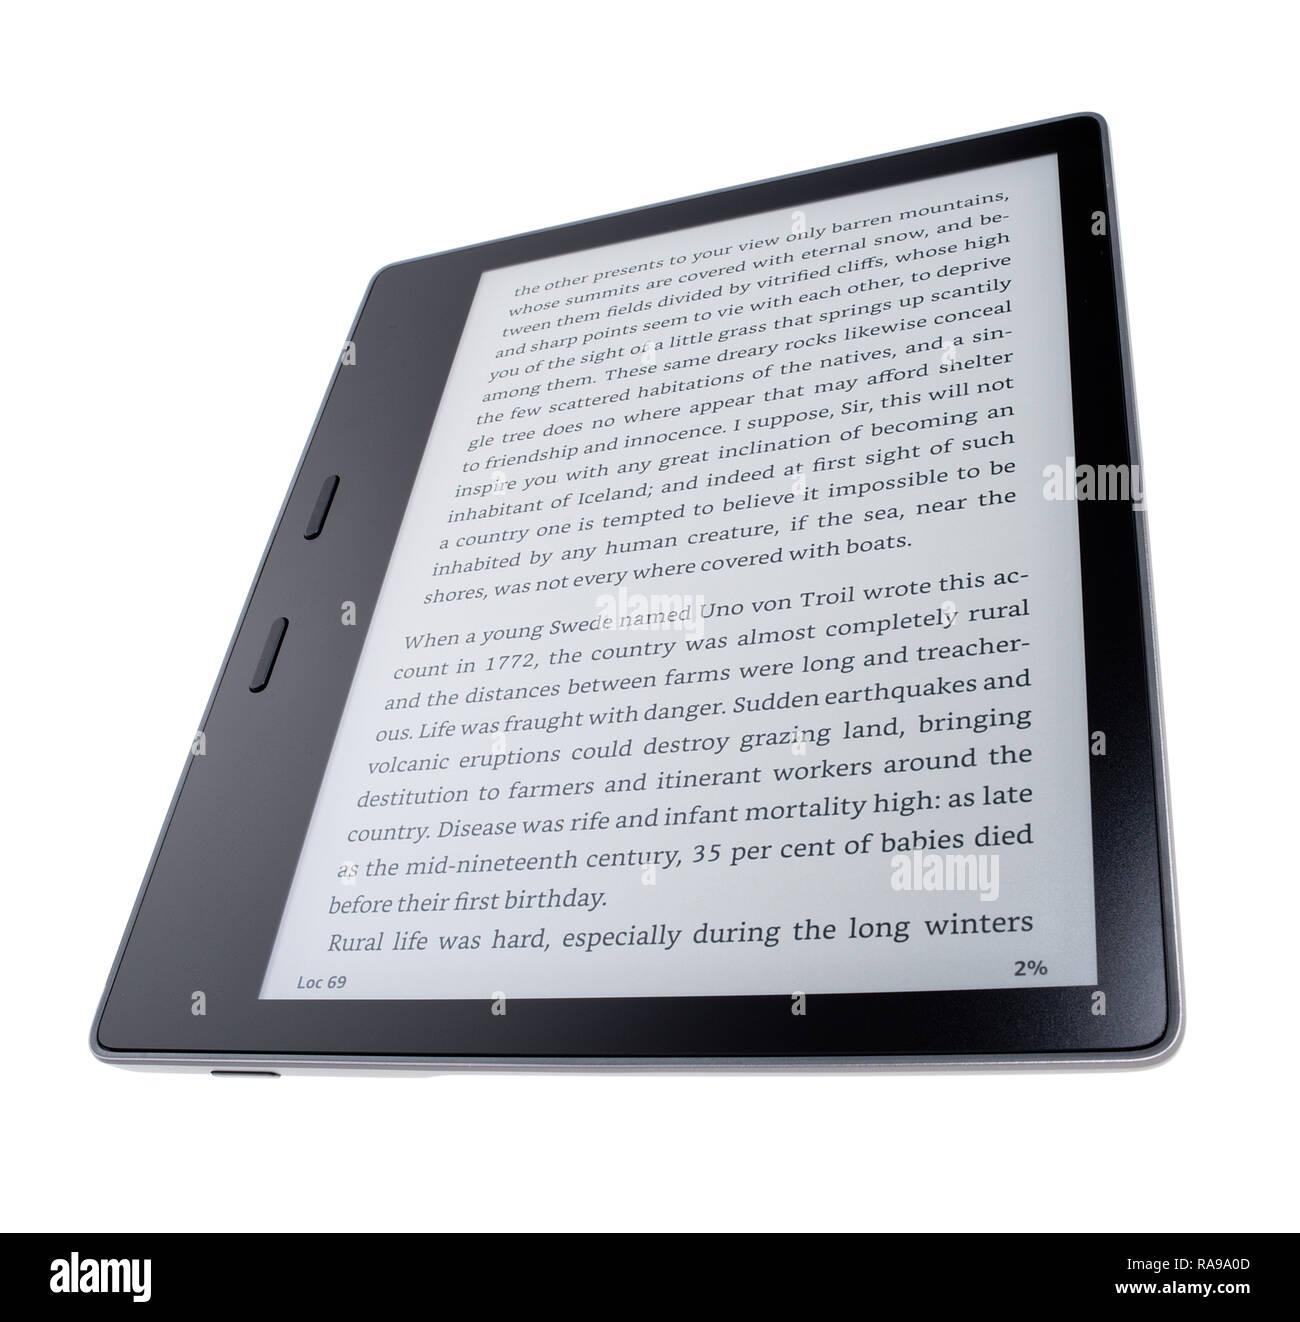 Ebook reader display, Kindle Oasis. - Stock Image